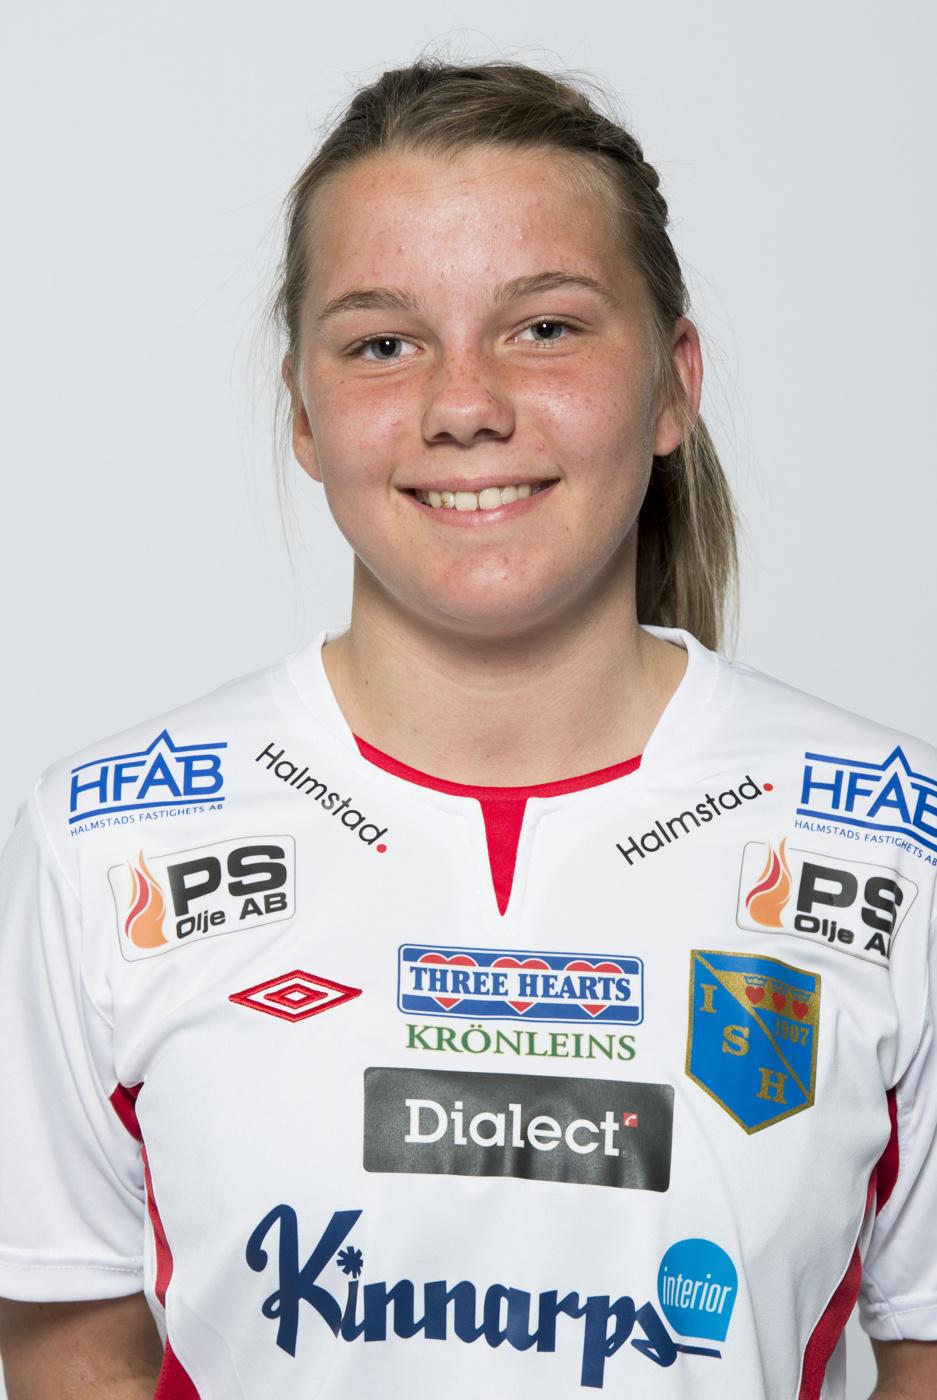 Ebba Hed tog plats i det svenska F16-landslaget som i oktober ska kvala till 52757cafc8192